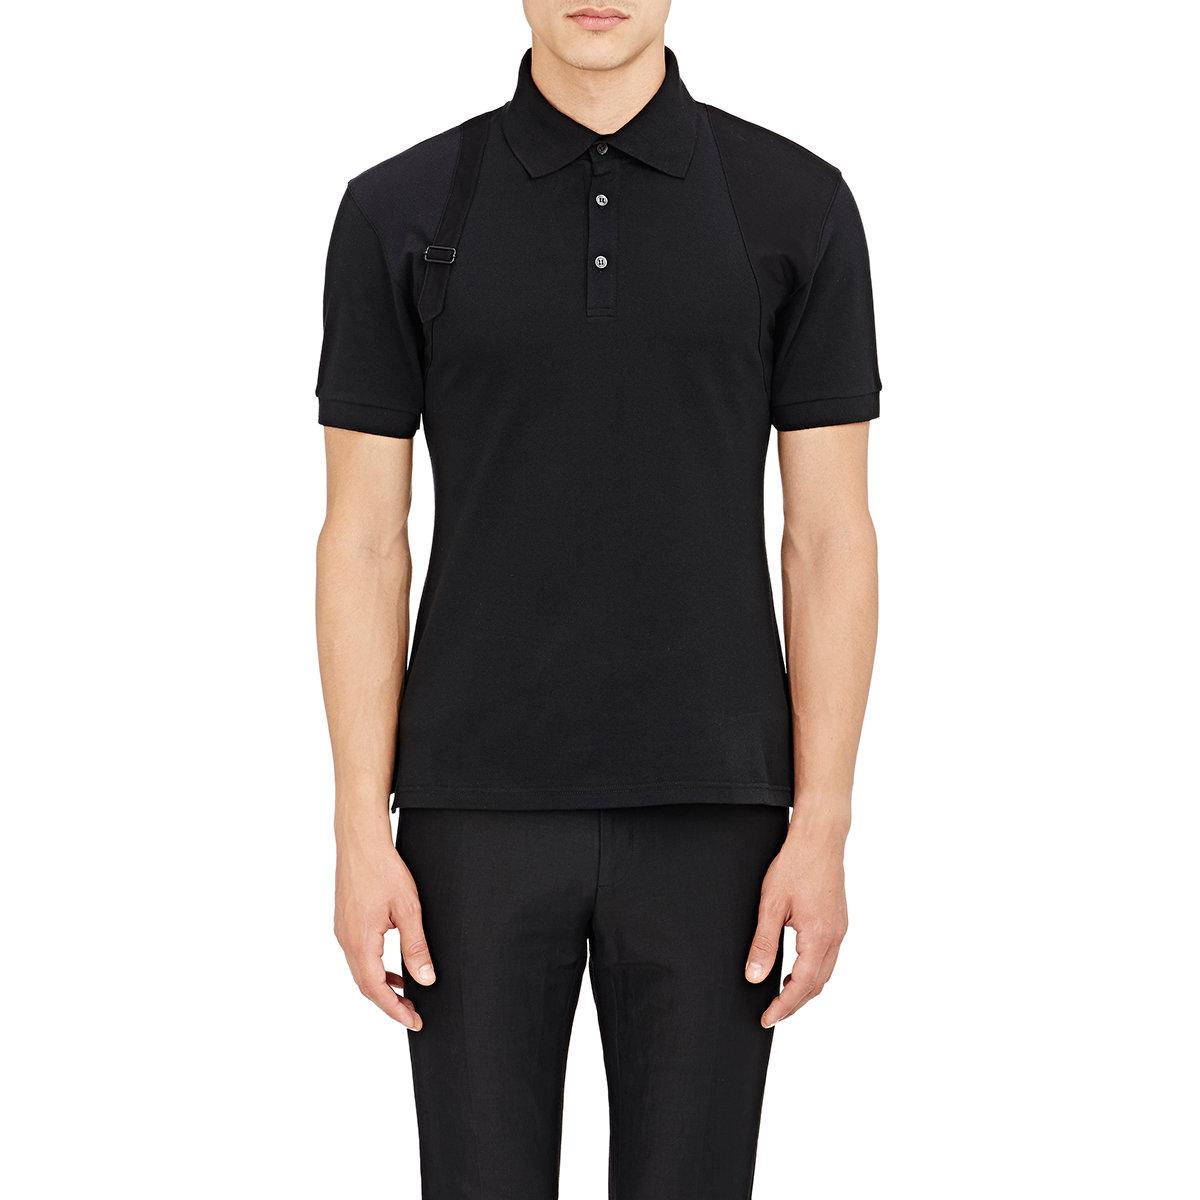 Alexander mcqueen men 39 s trompe l 39 oeil polo shirt in black for Alexander mcqueen shirt men